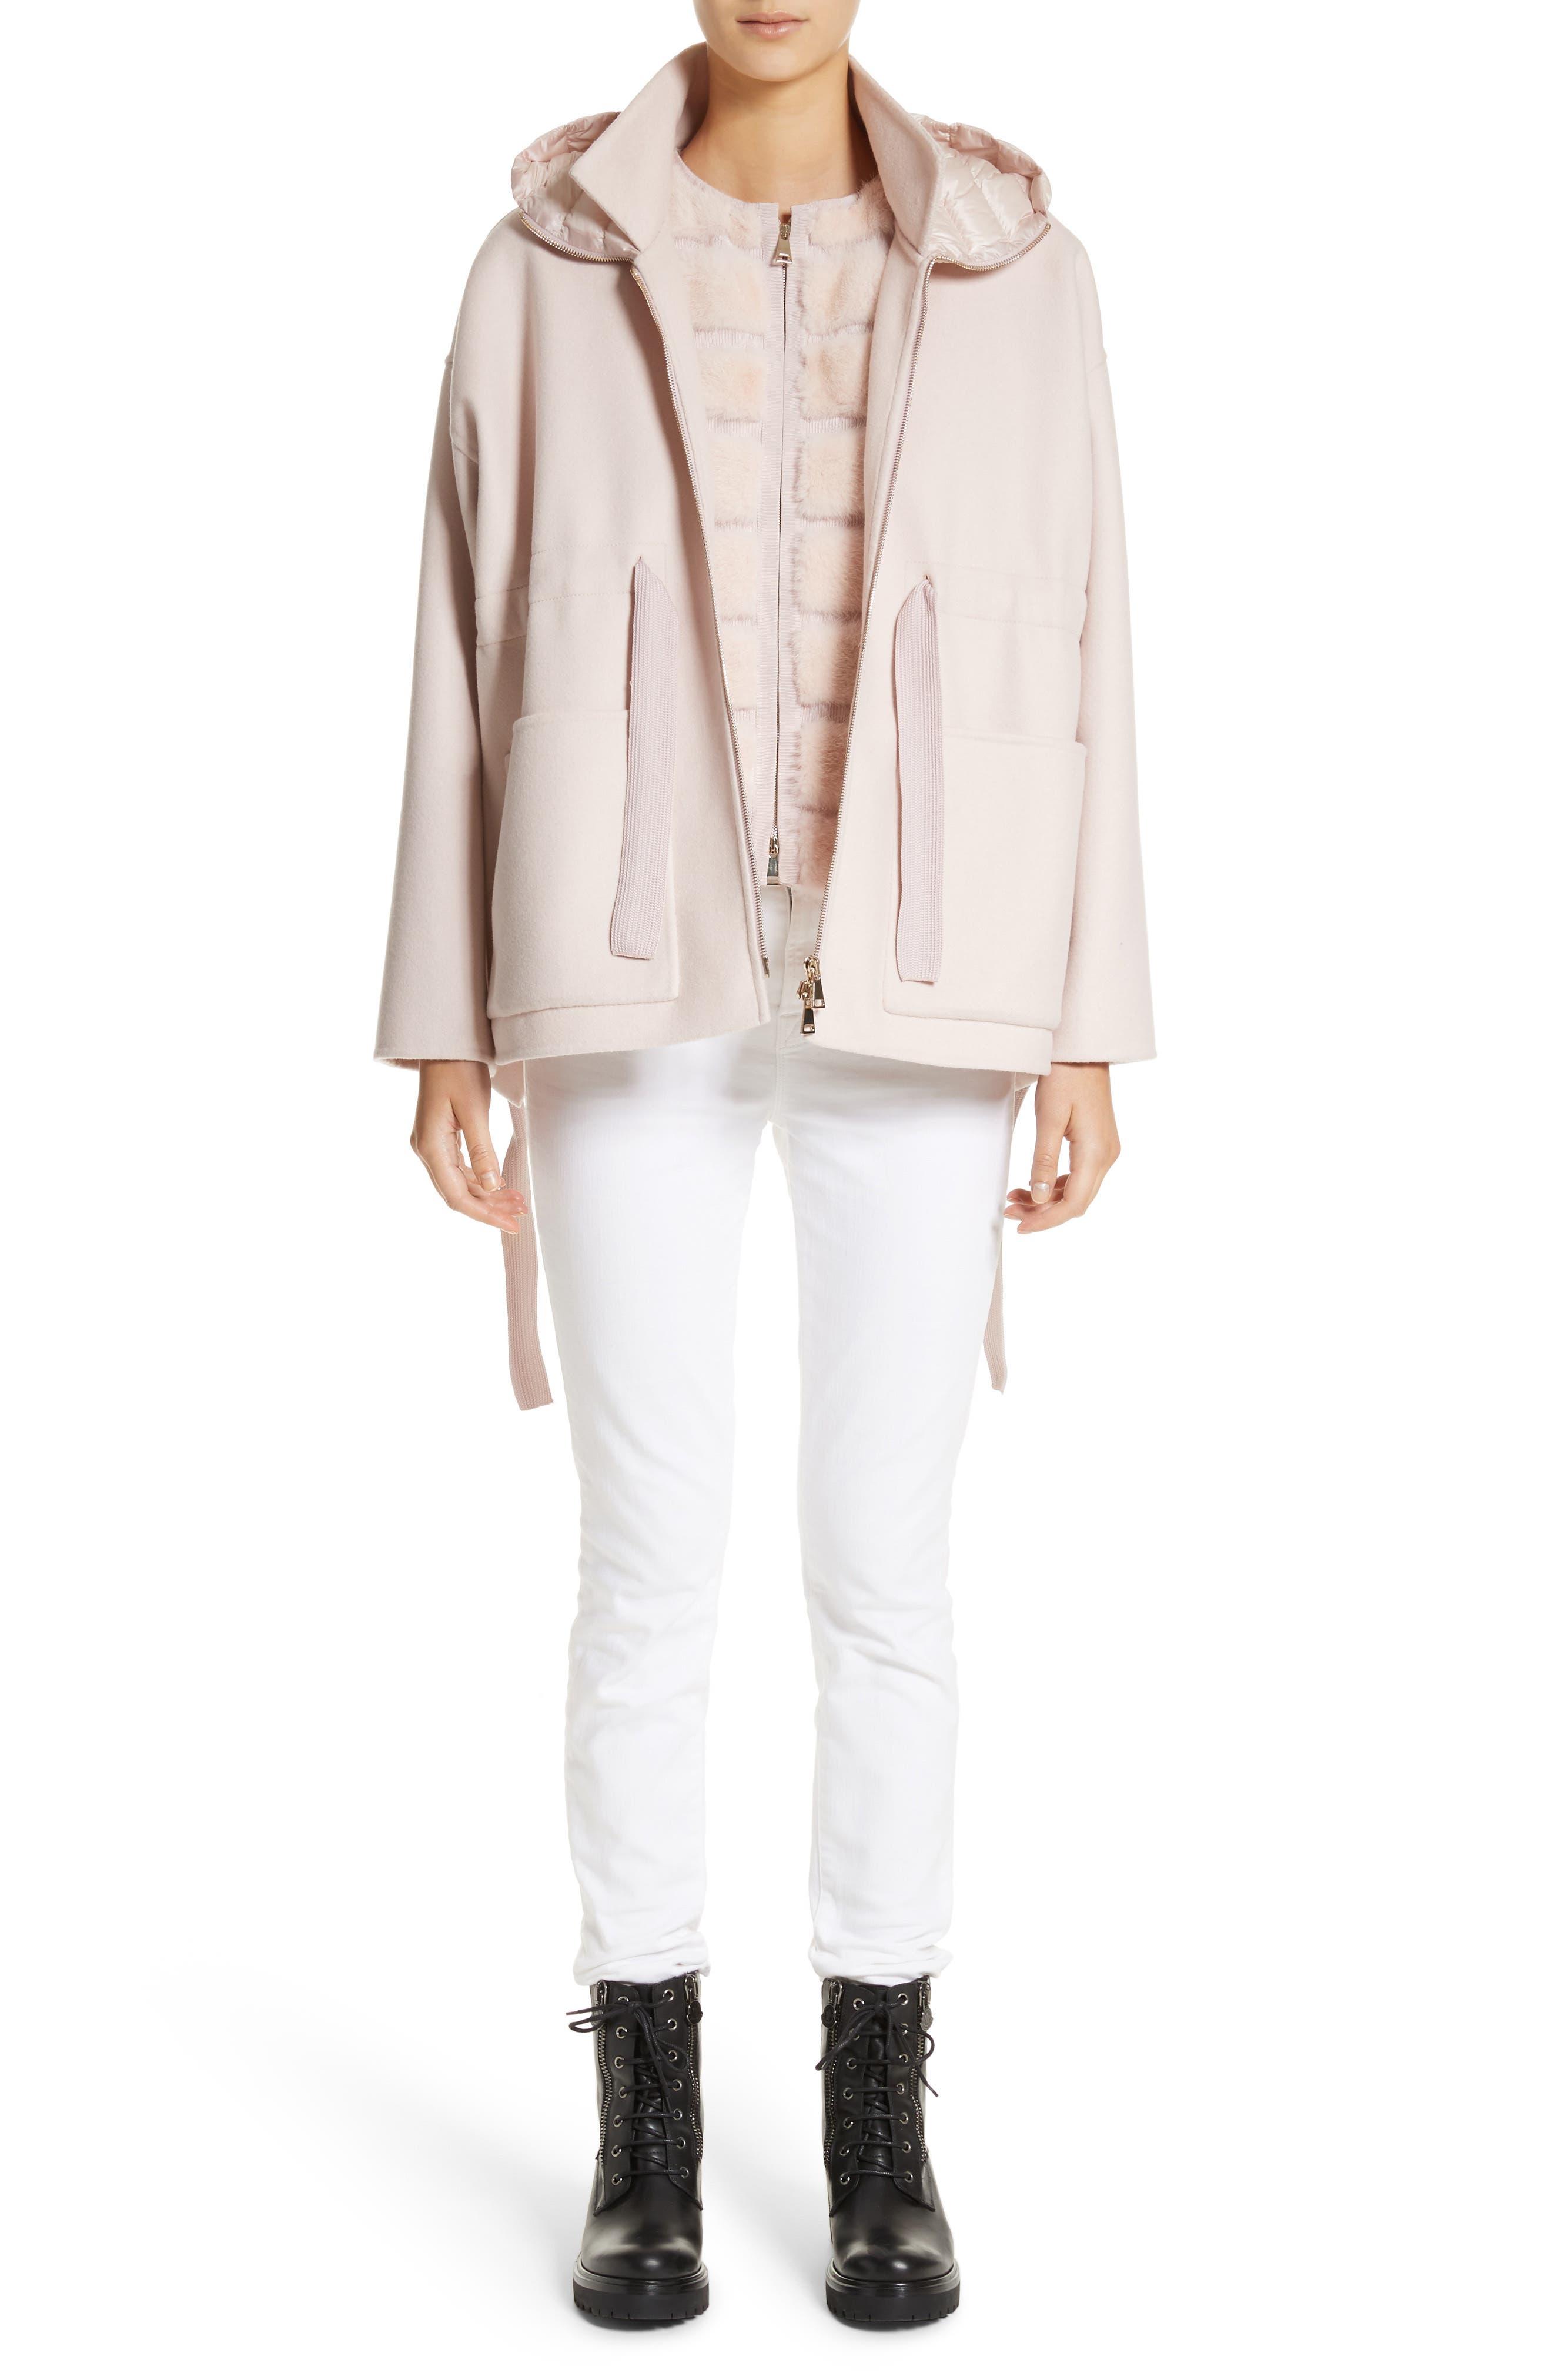 Ametrine Wool & Cashmere Vest with Genuine Mink Fur Trim & Removable Hood,                             Alternate thumbnail 8, color,                             Blush